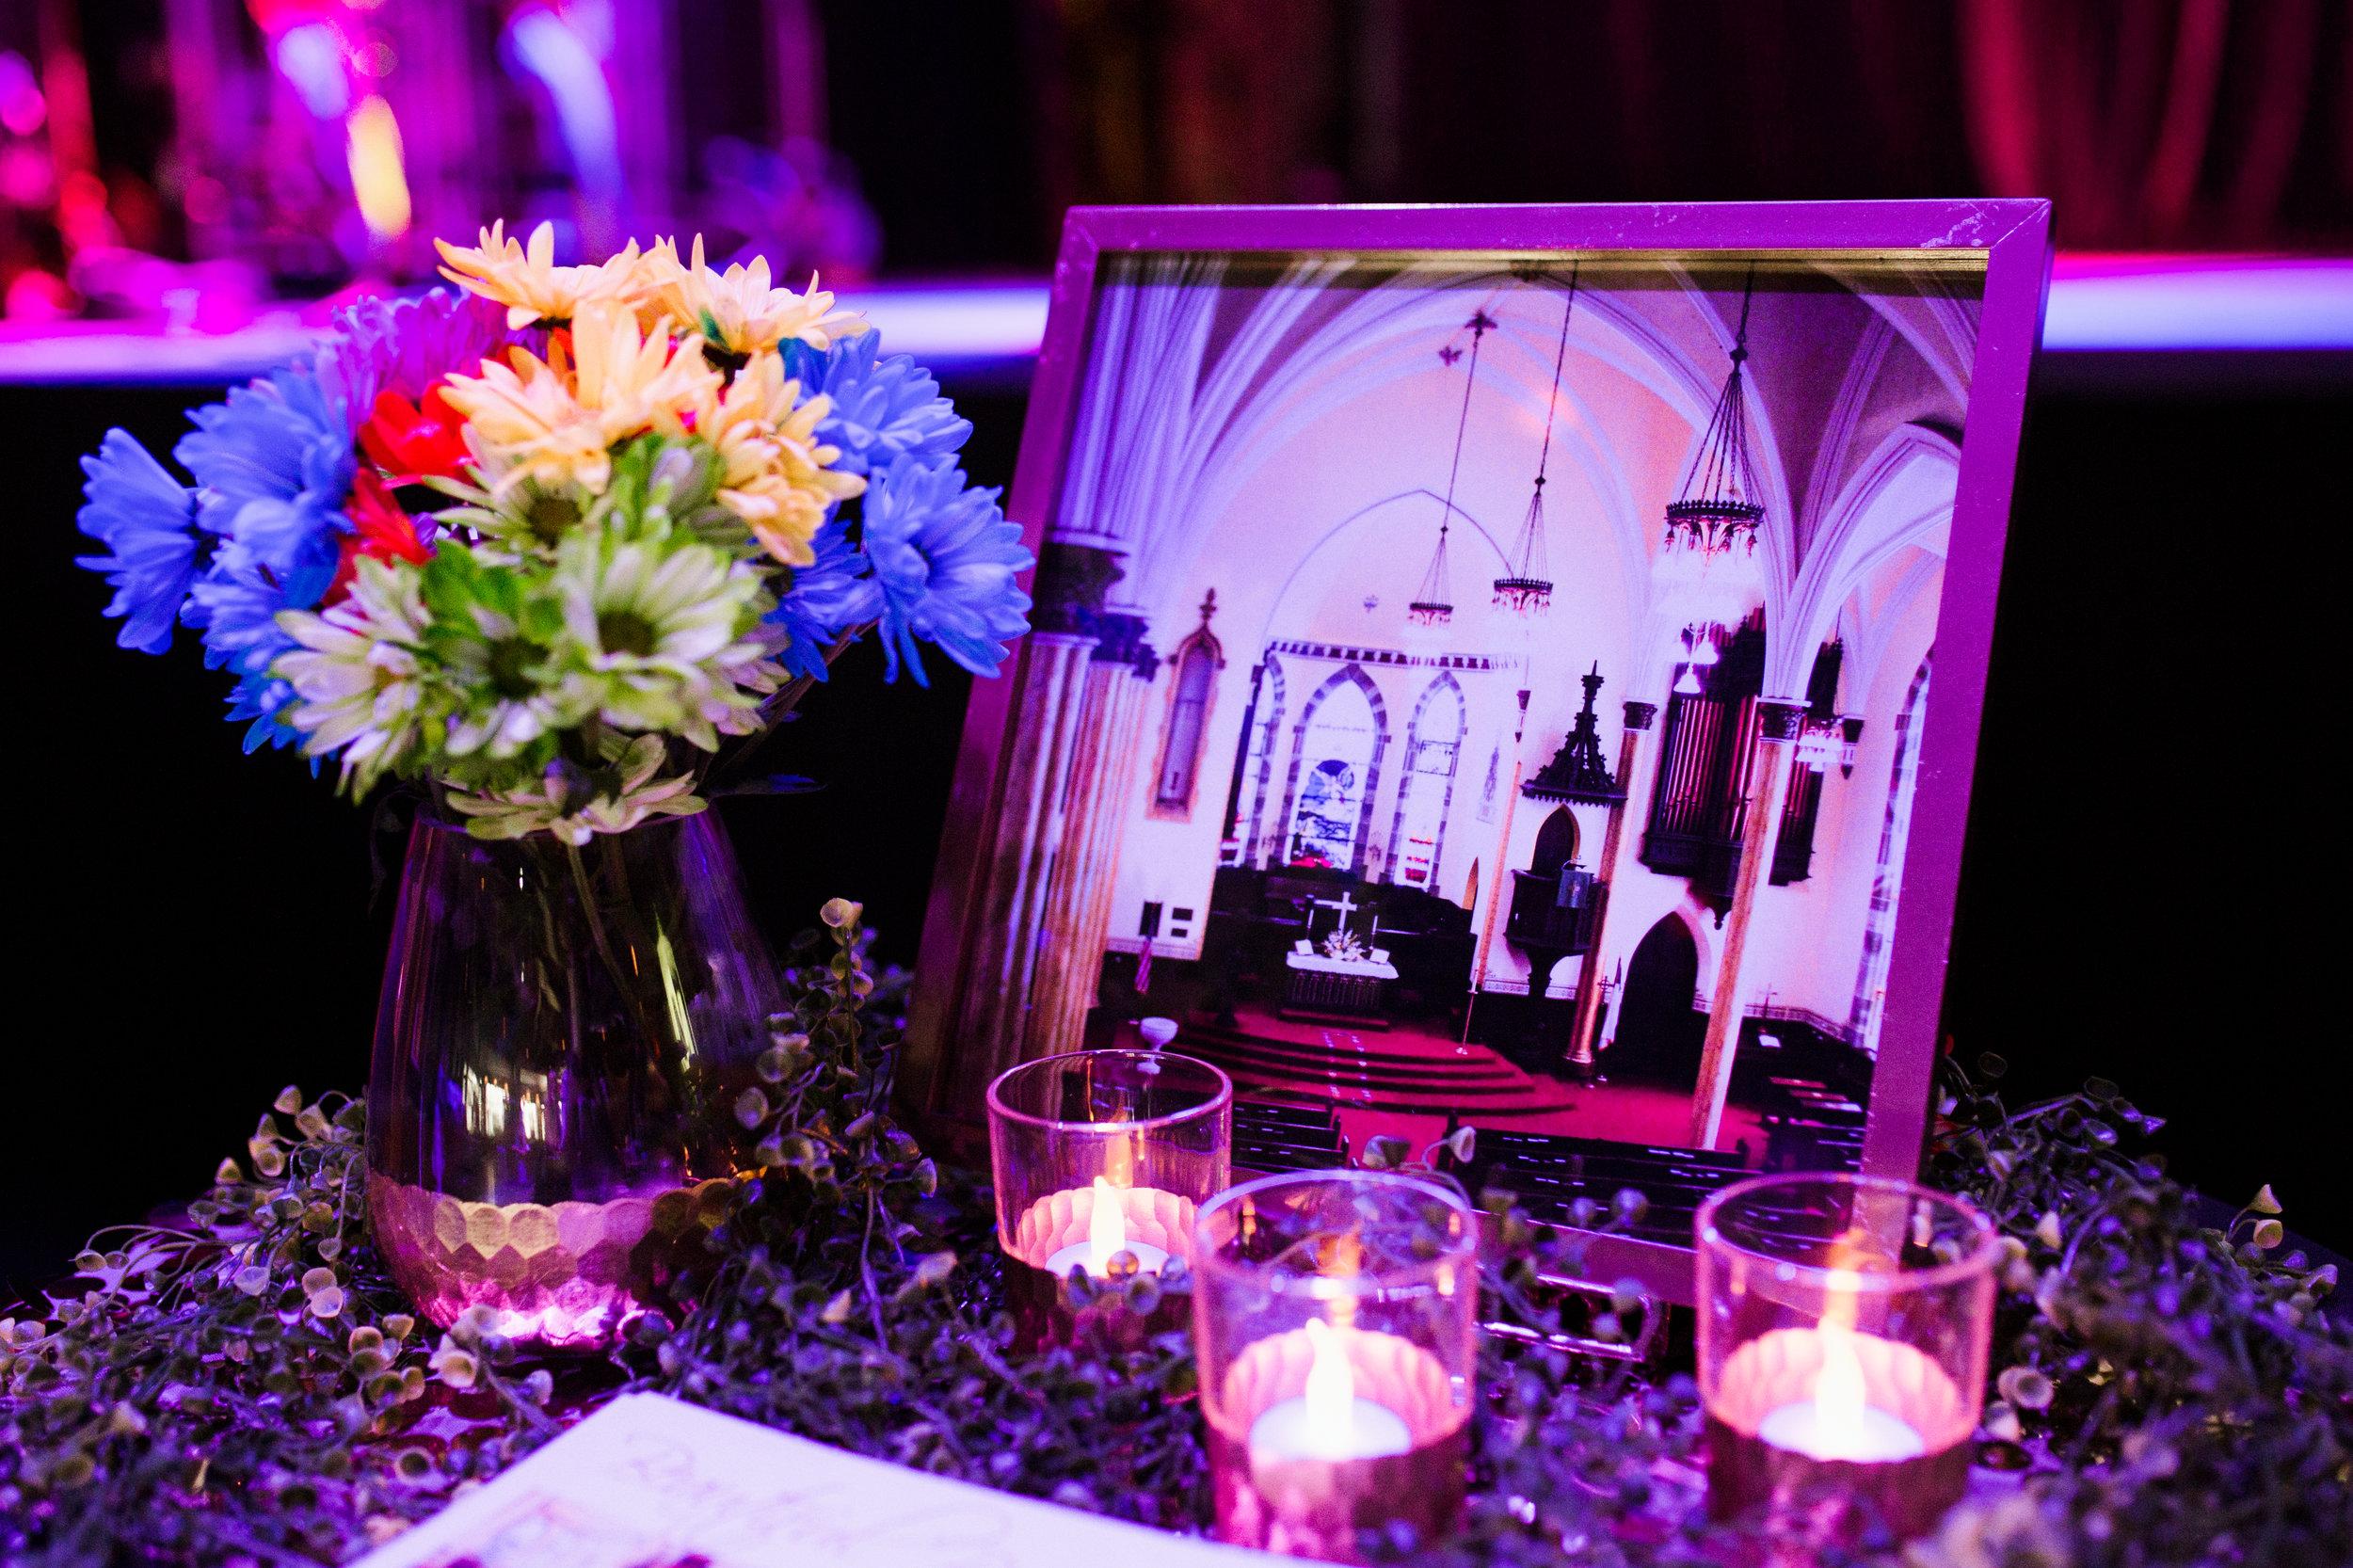 Modern Louisville Magazine Modern Vows Launch Party at Mercury Ballroom 5-17-17 Crystal Ludwick Photo 12.jpg